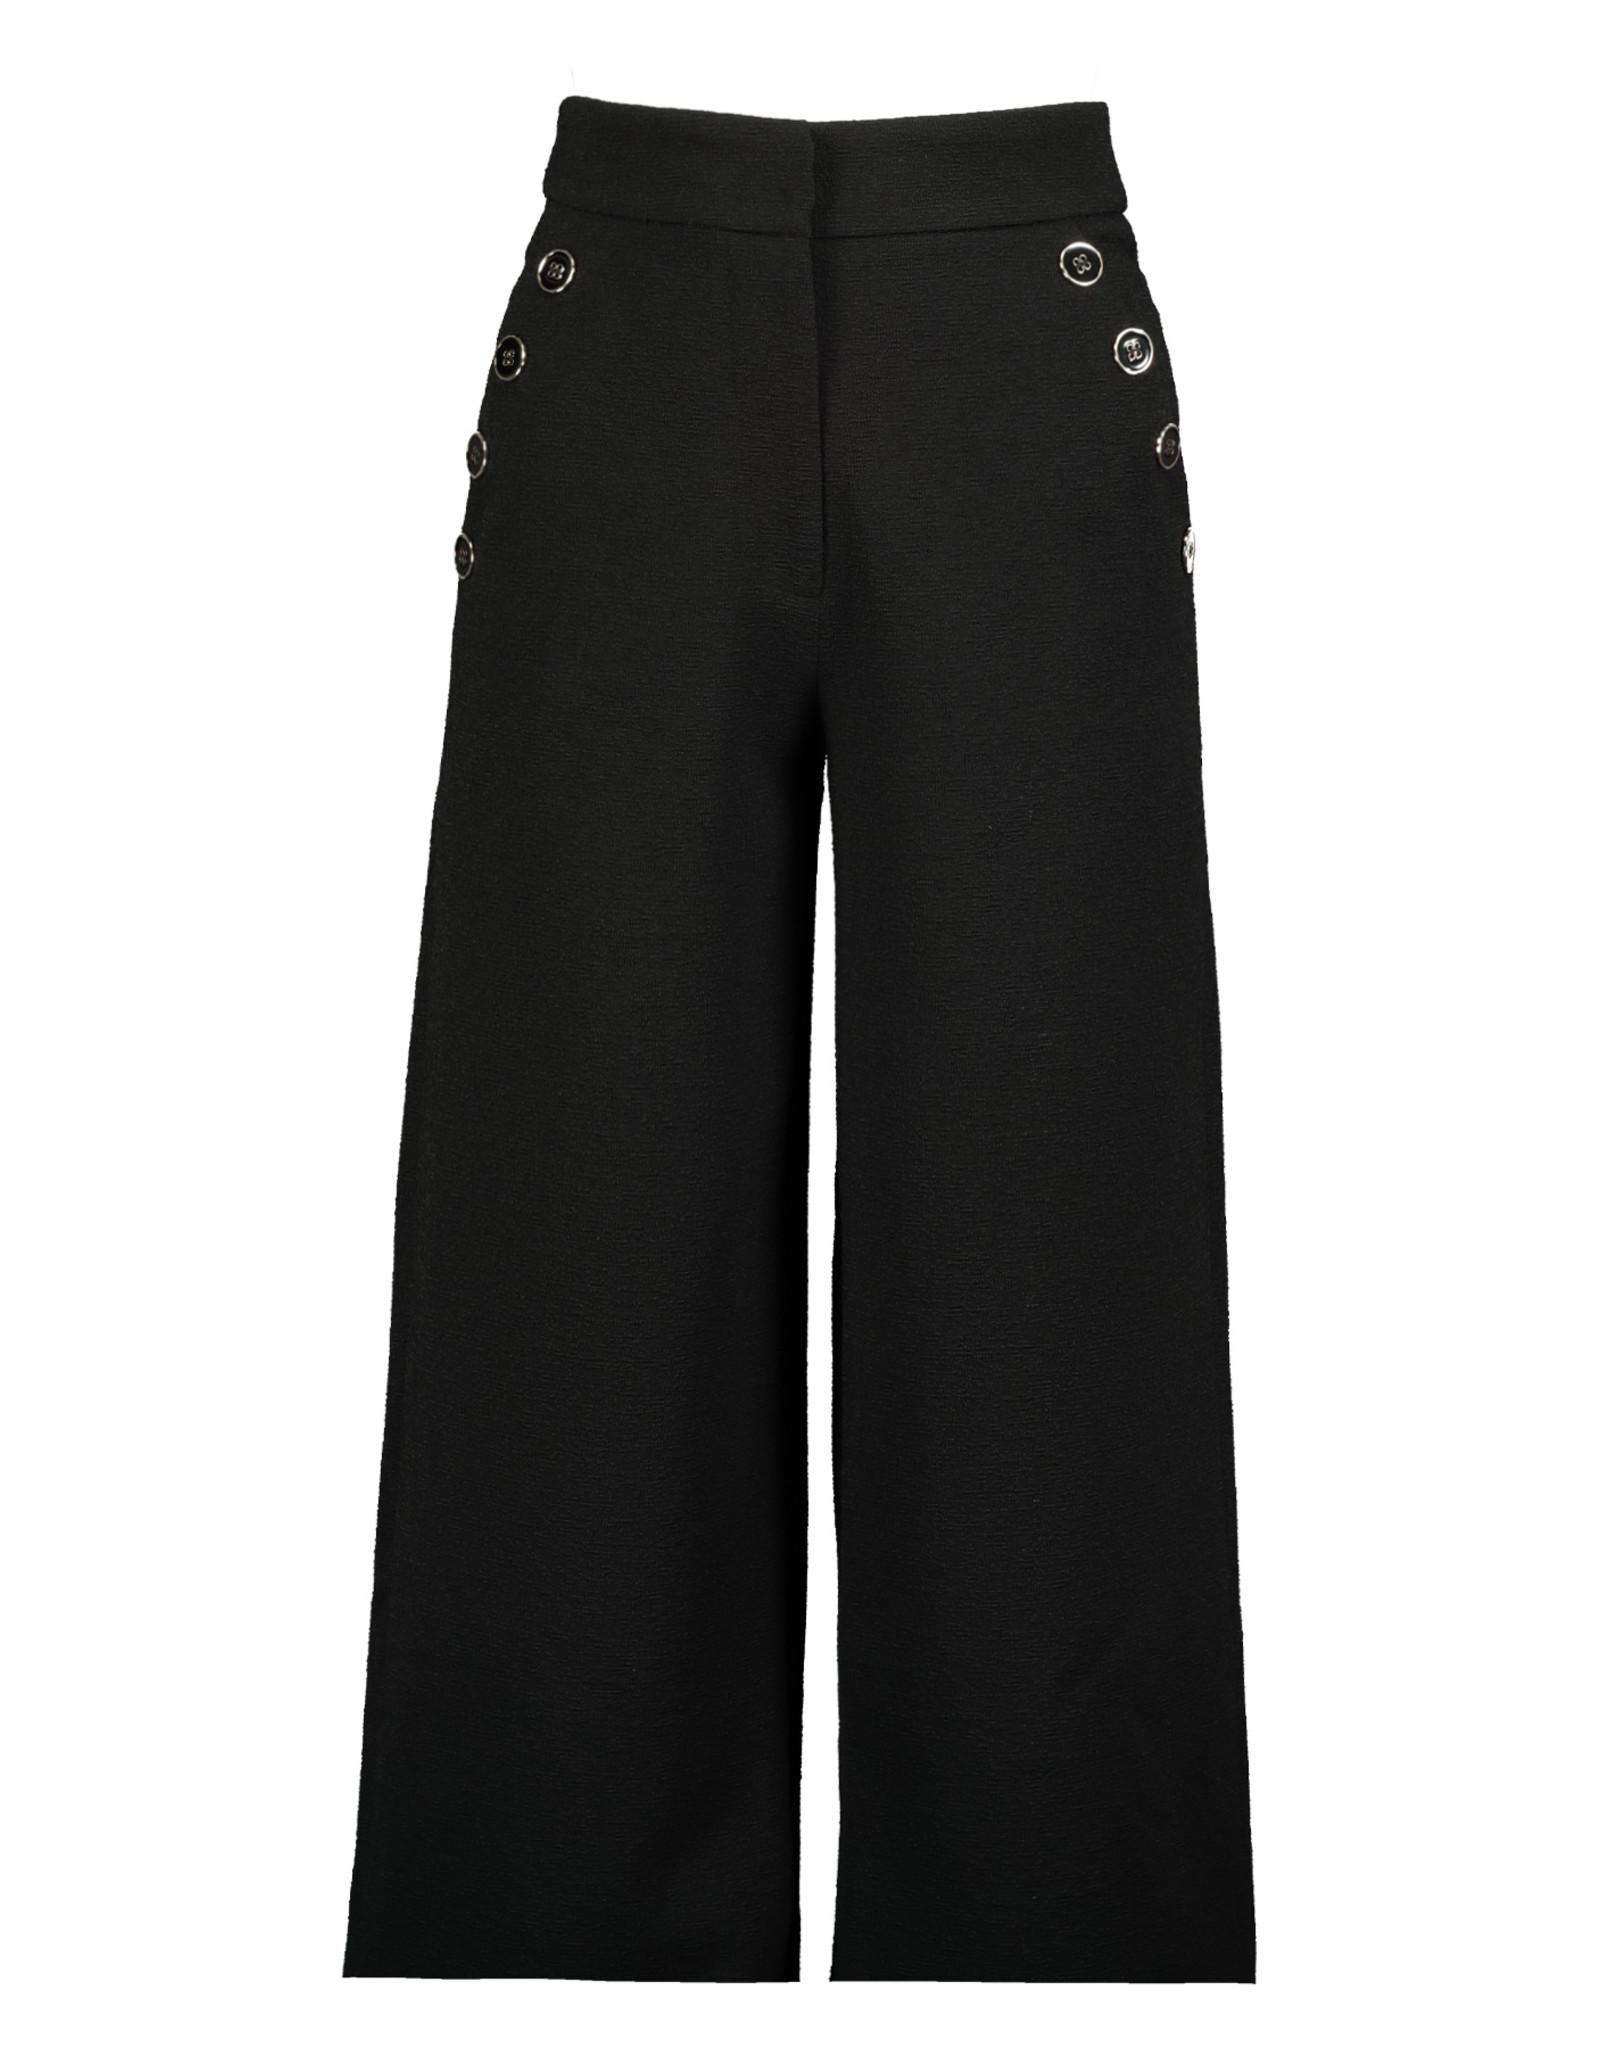 Femme Wide Leg Pant, Caviar Cav